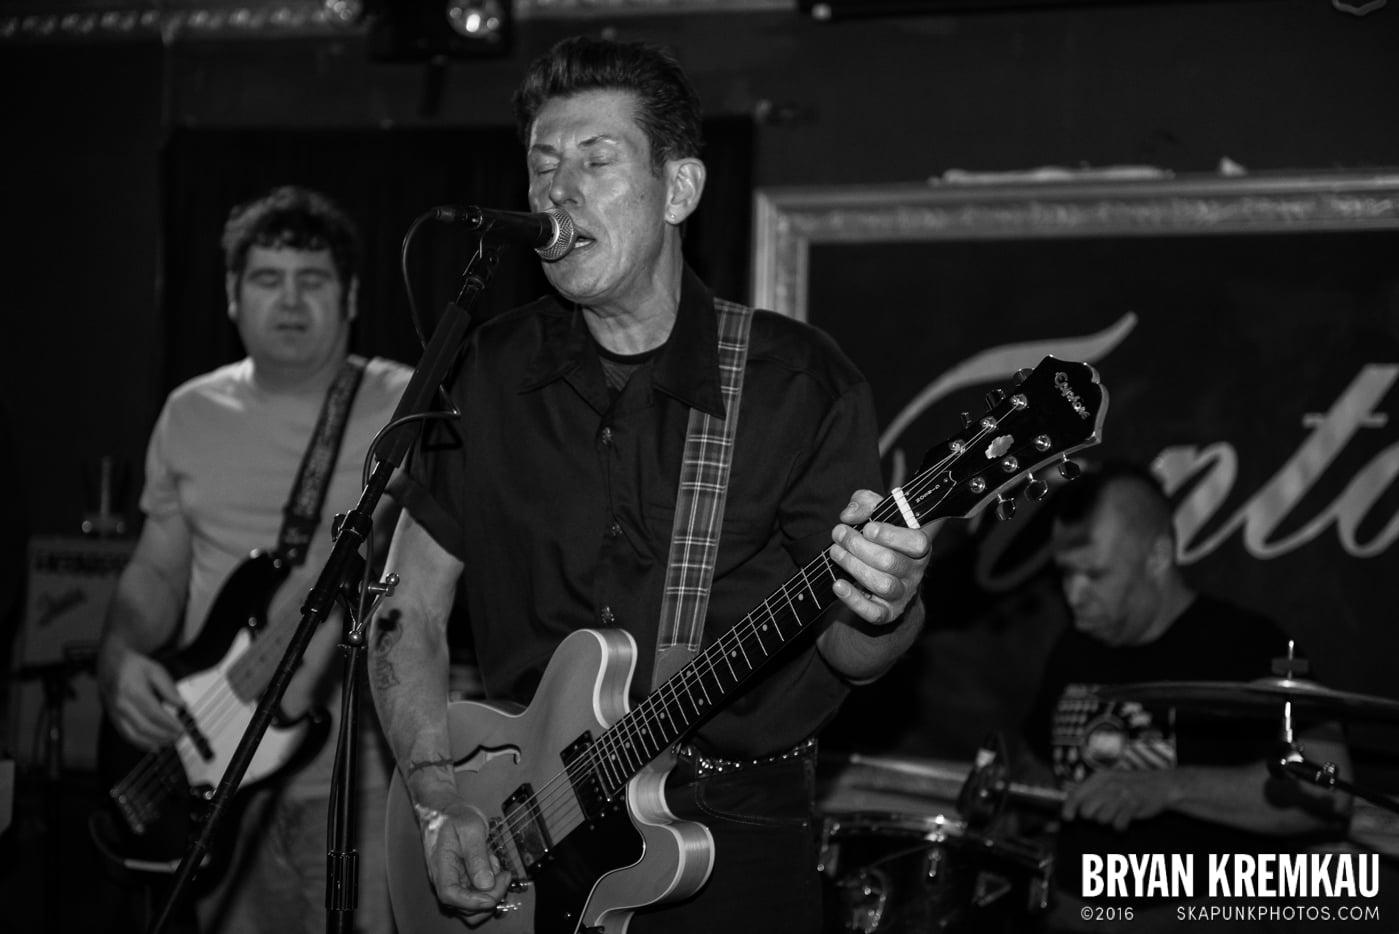 Roddy Radiation & The Scotch Bonnets @ Fontana's, NYC - 4.25.15 (24)